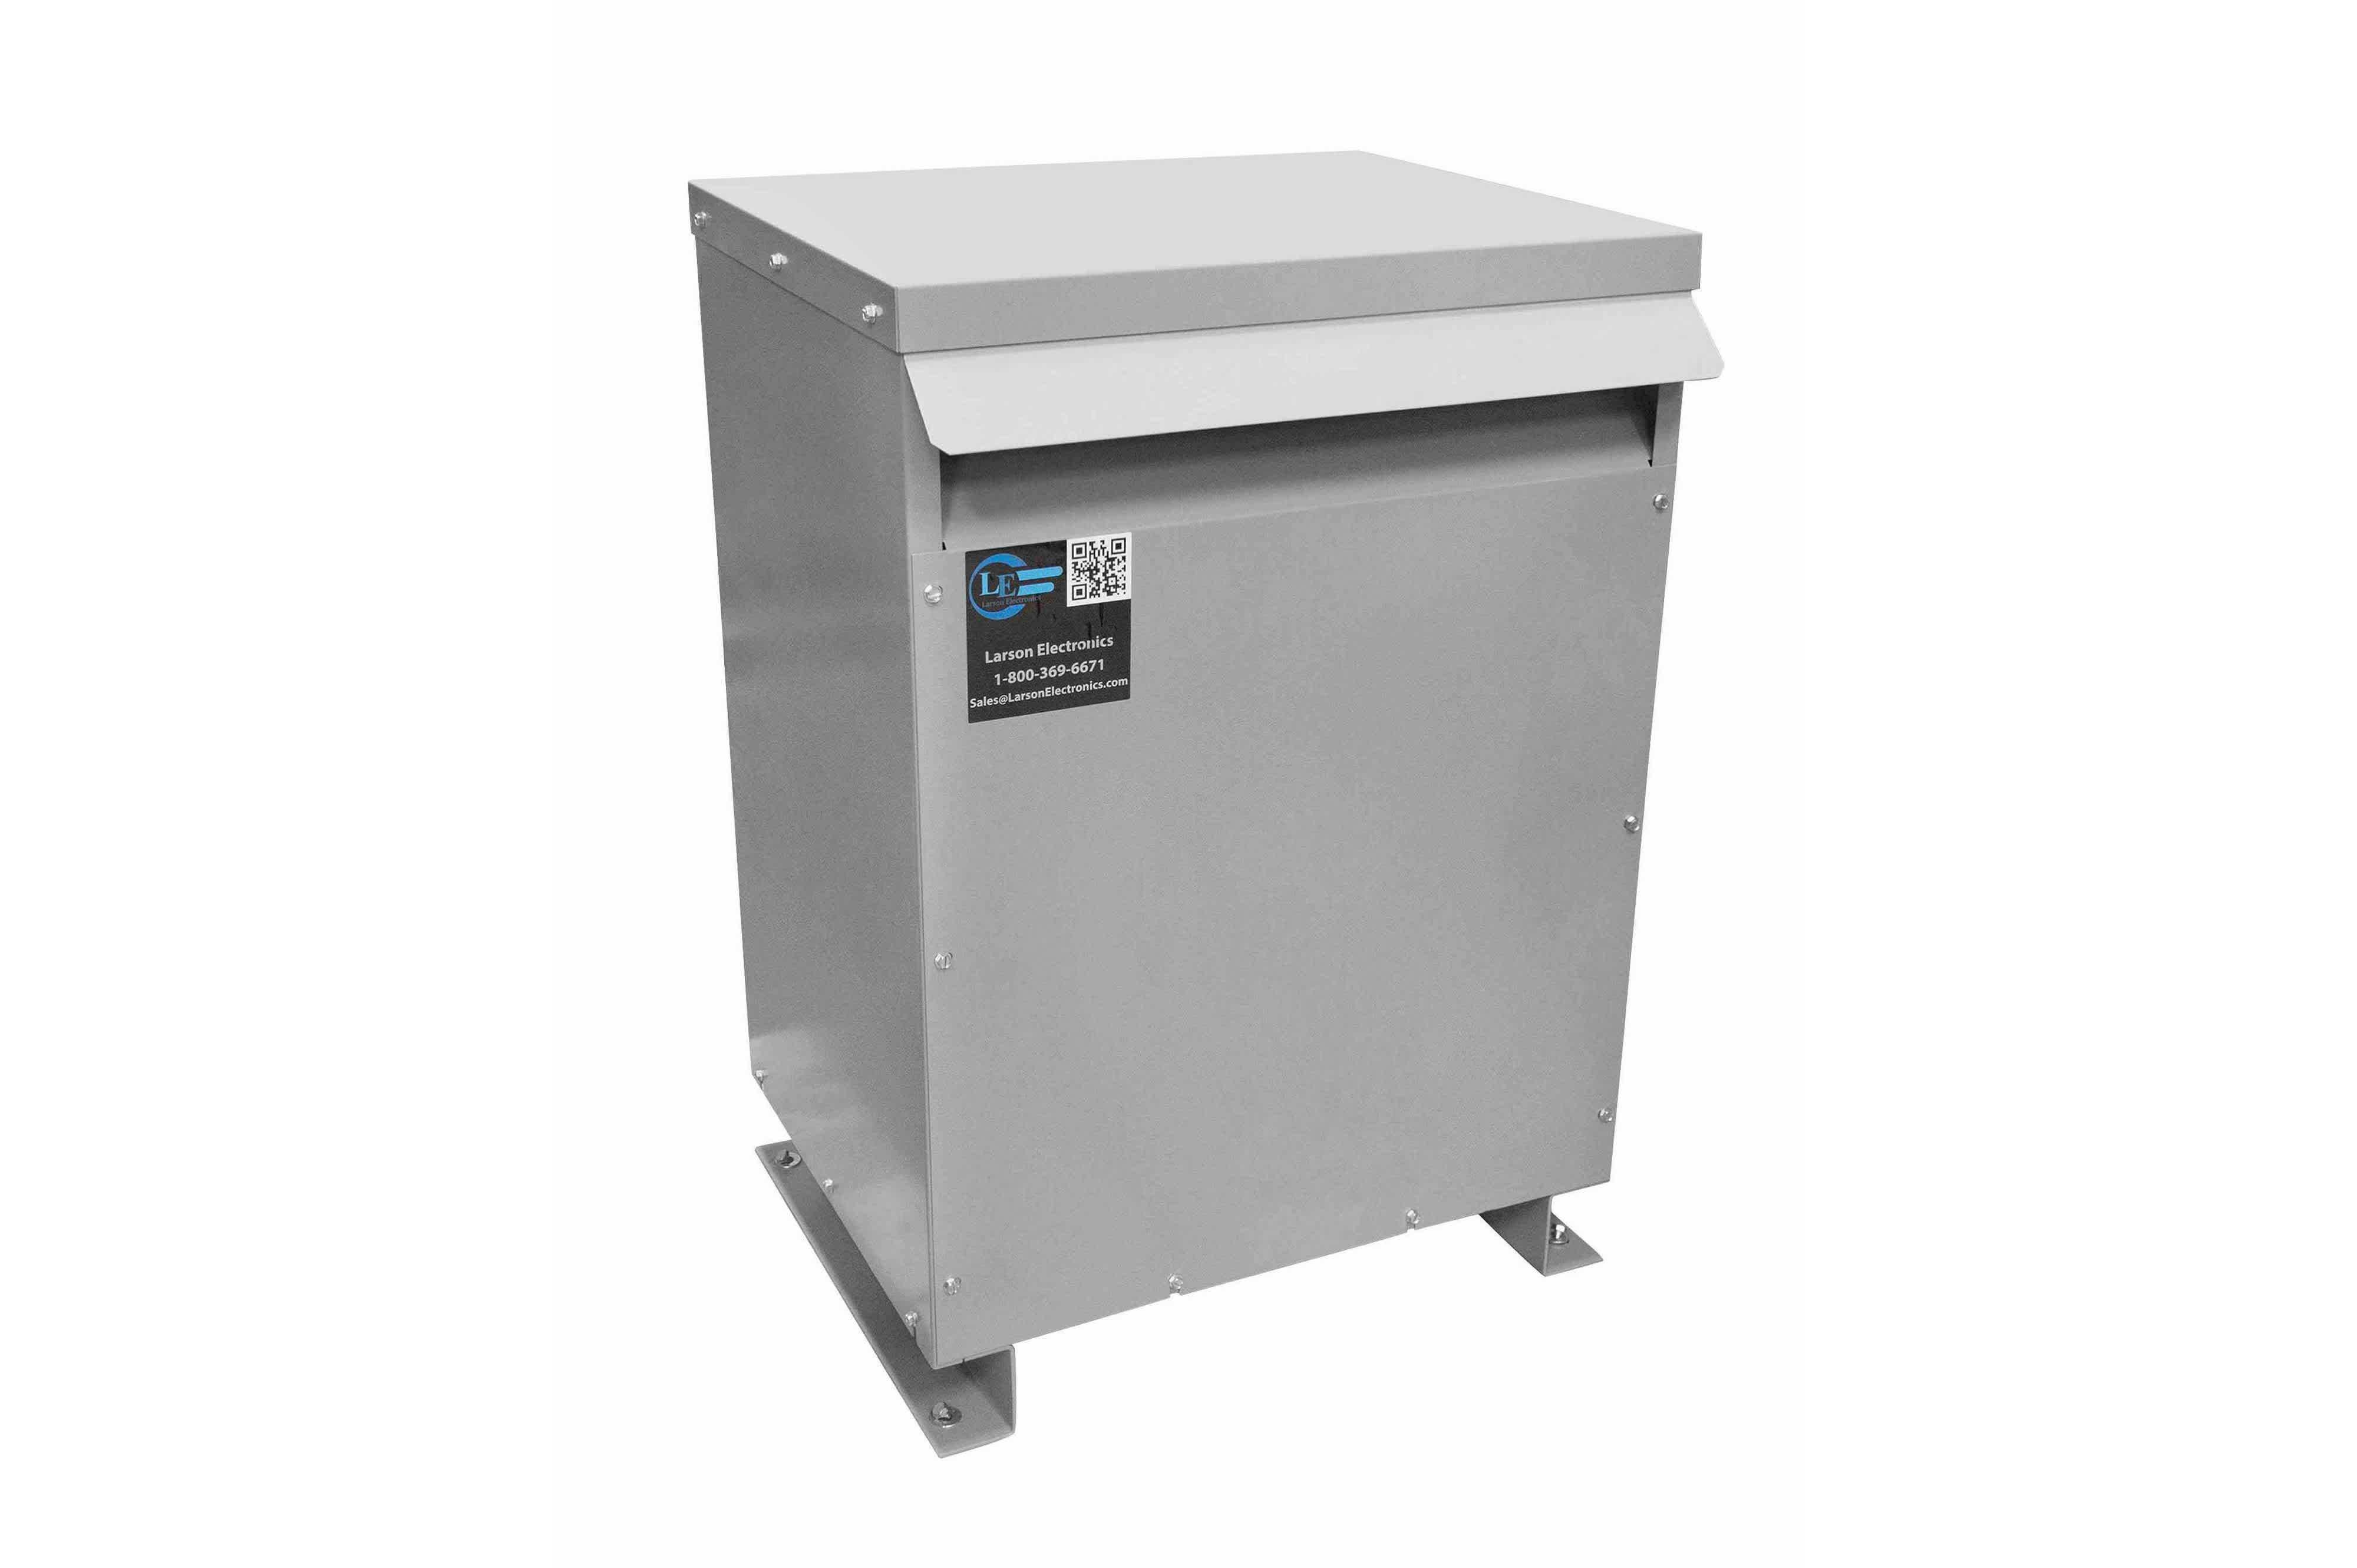 700 kVA 3PH Isolation Transformer, 600V Wye Primary, 240V Delta Secondary, N3R, Ventilated, 60 Hz